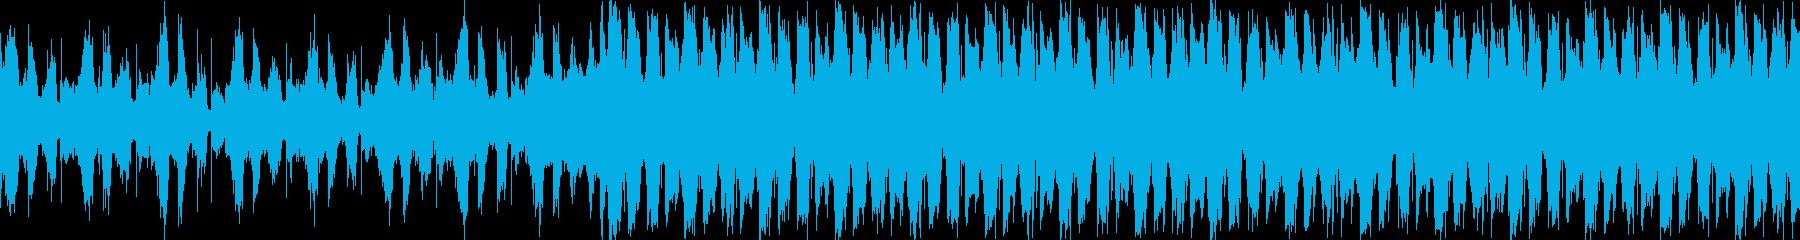 VP、CM、クールで穏やかな透明感ループの再生済みの波形